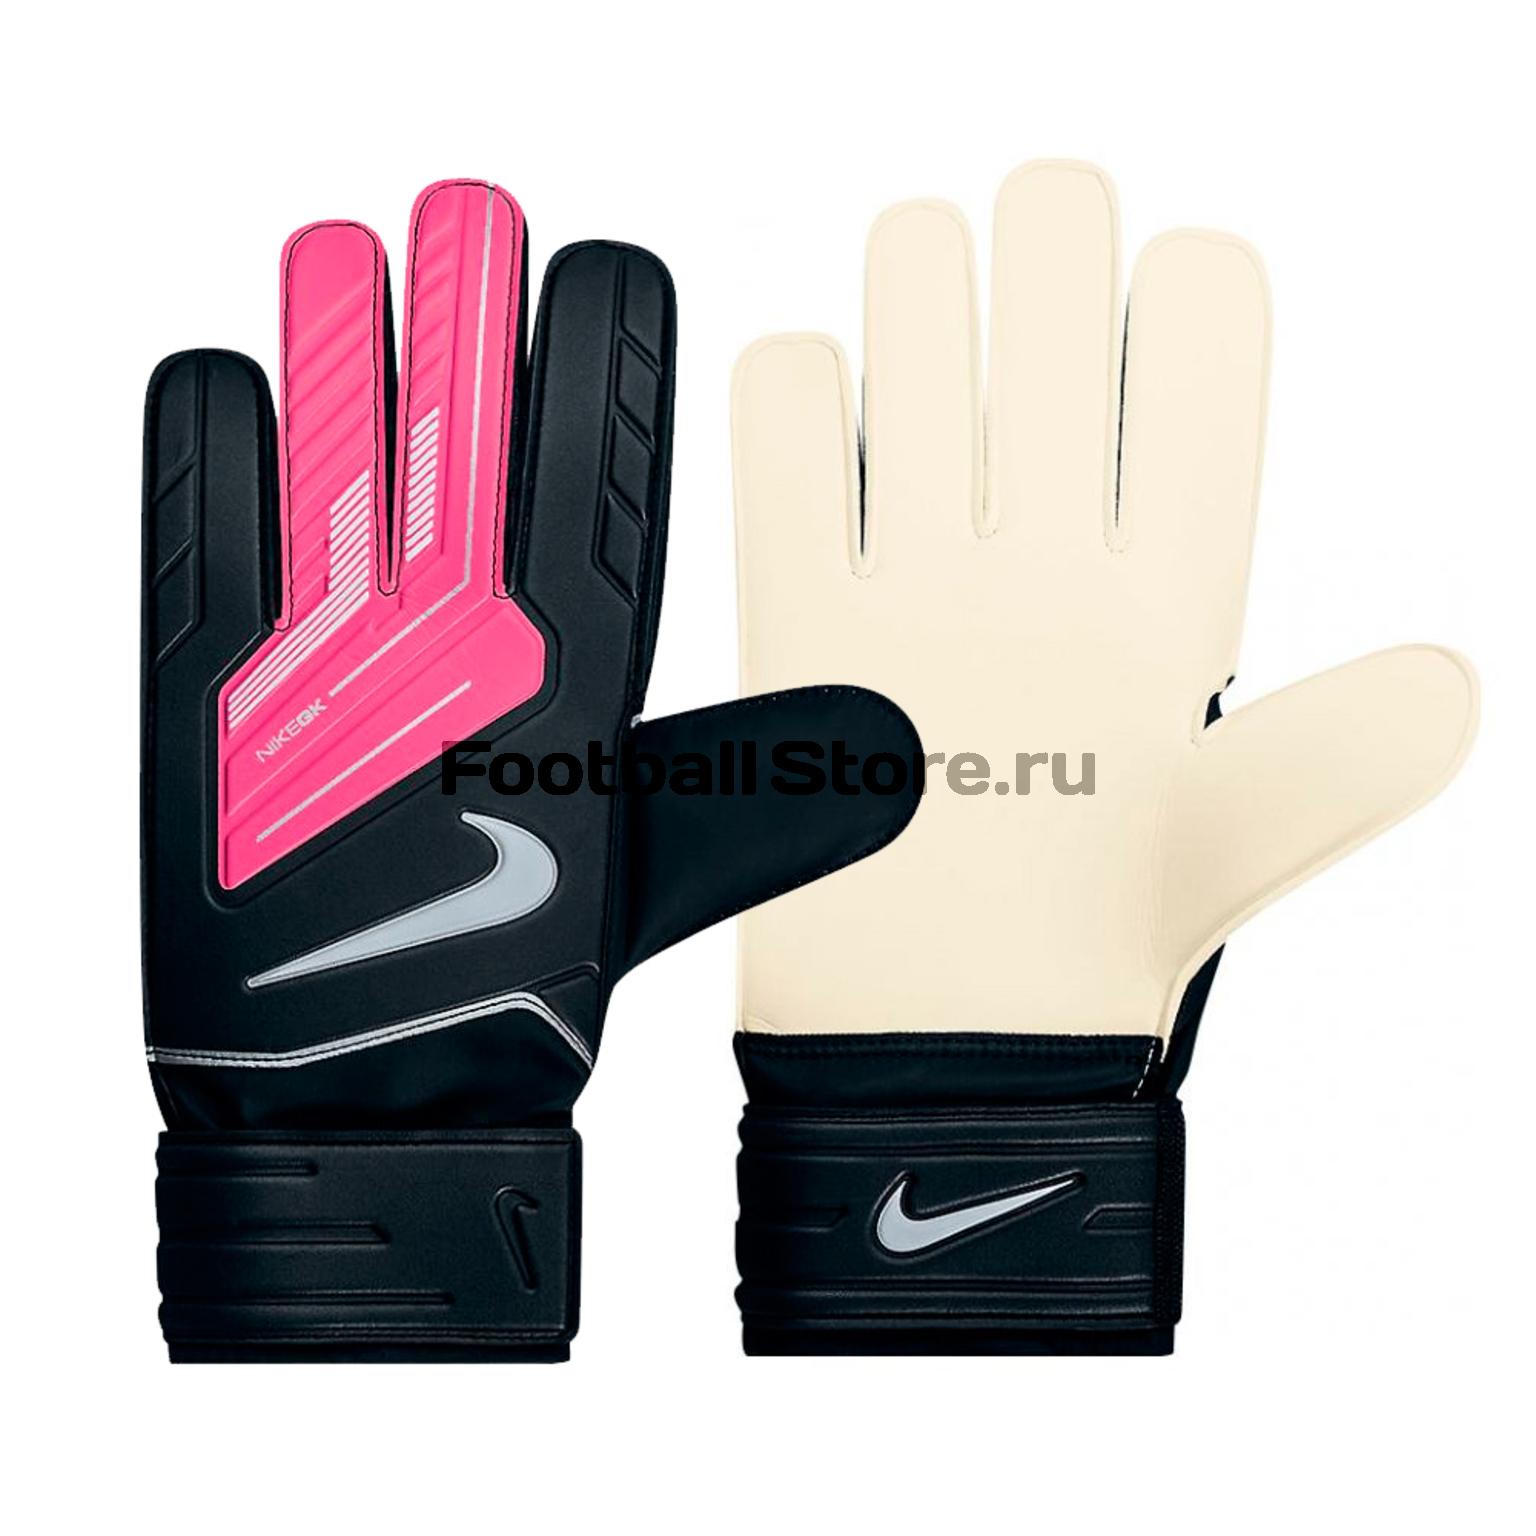 Перчатки Nike Перчатки вратарские Nike GK Match GS0258-065